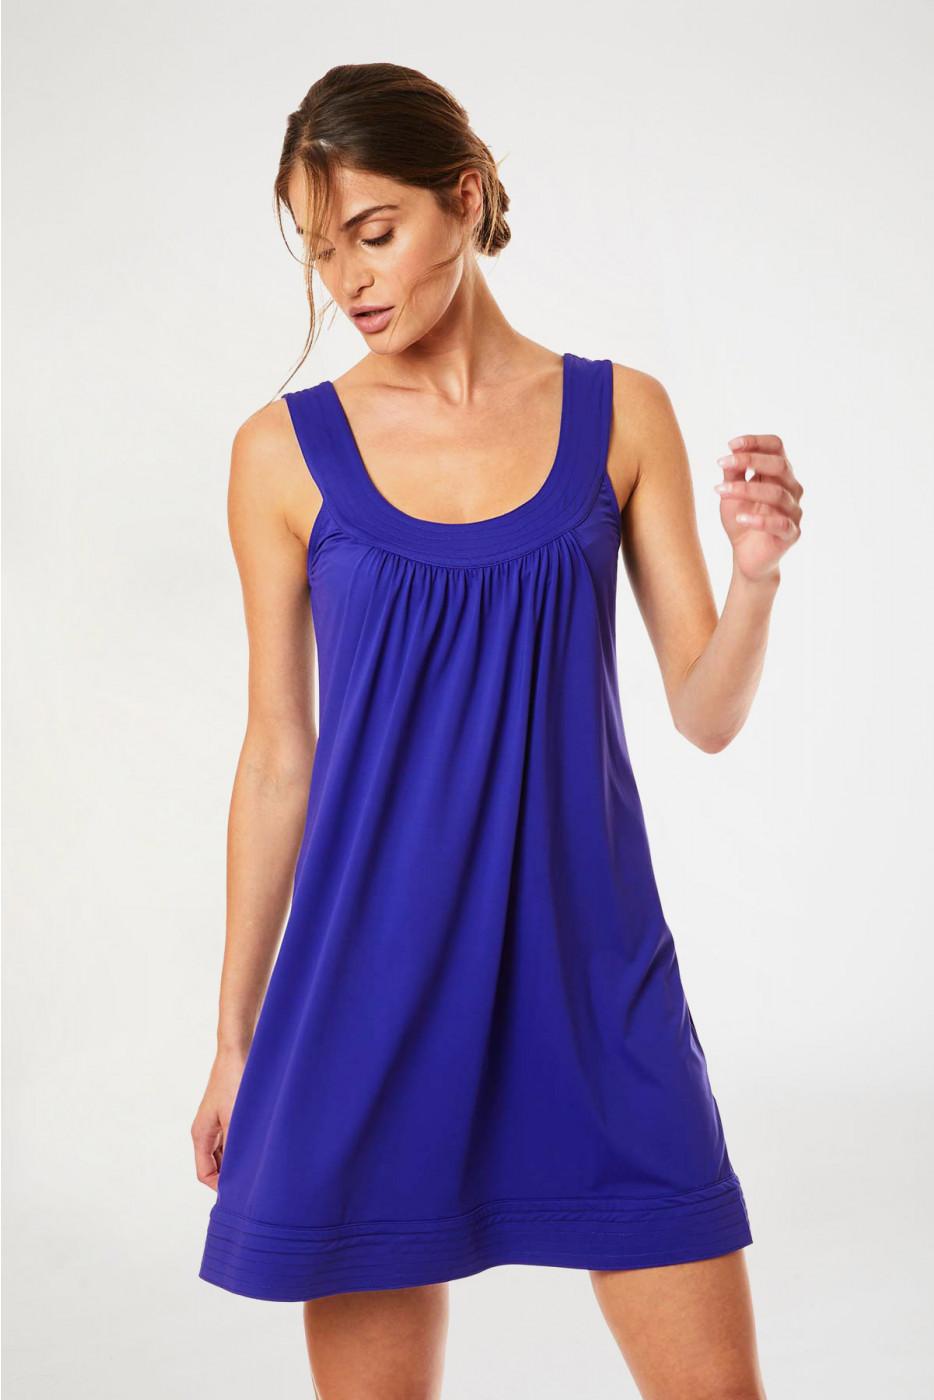 Robe de plage uni bleu indigo FLORIANE LAVANDOU